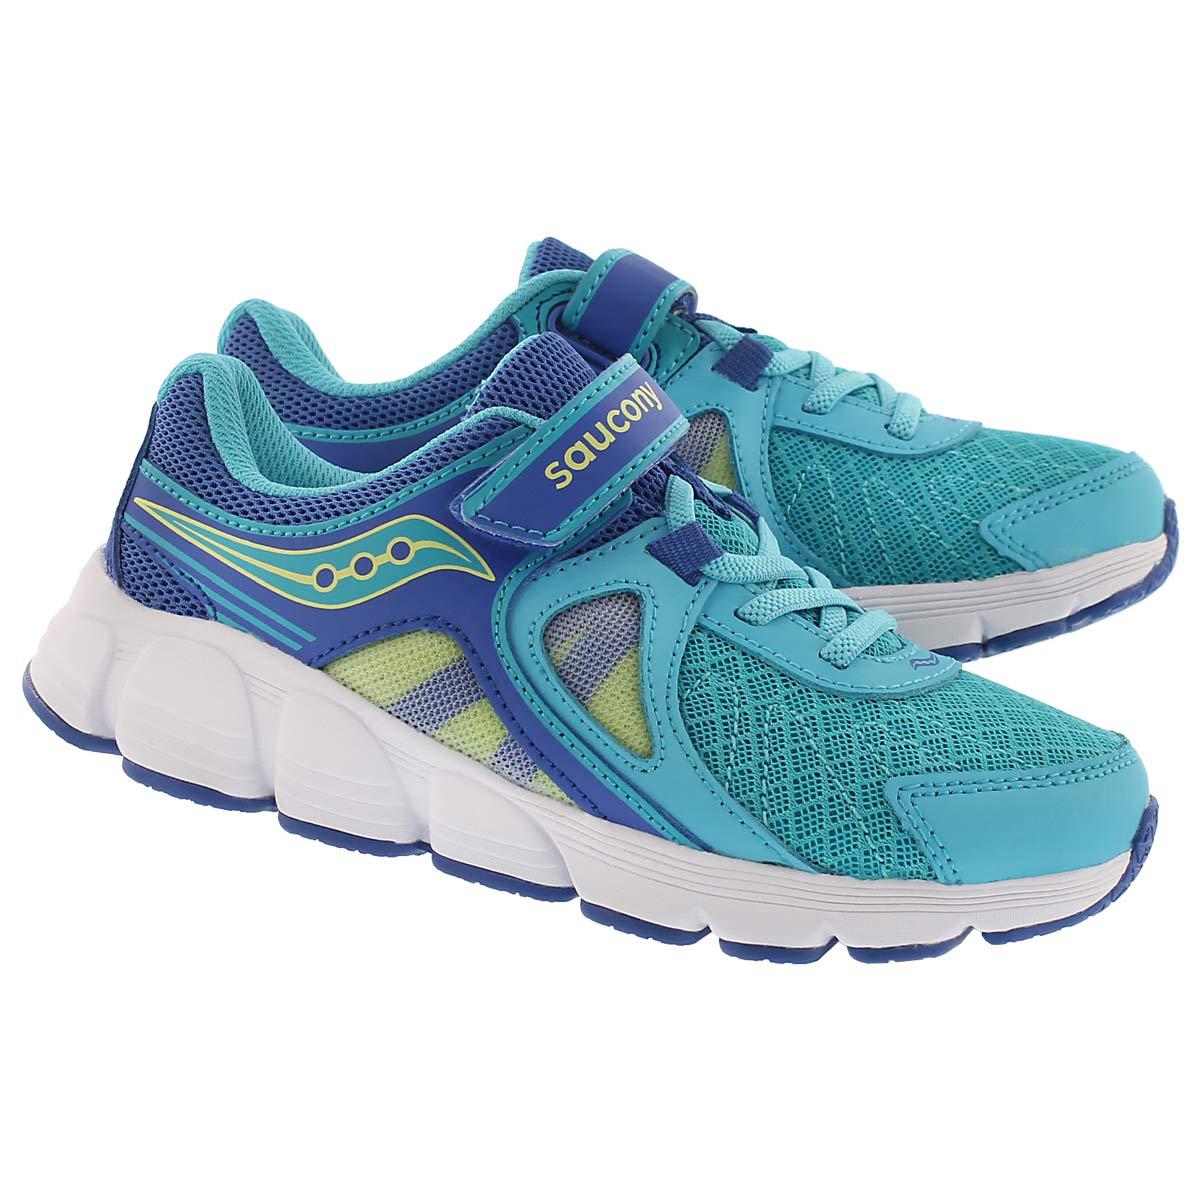 Grls Kotaro 3 turq/citron running shoe